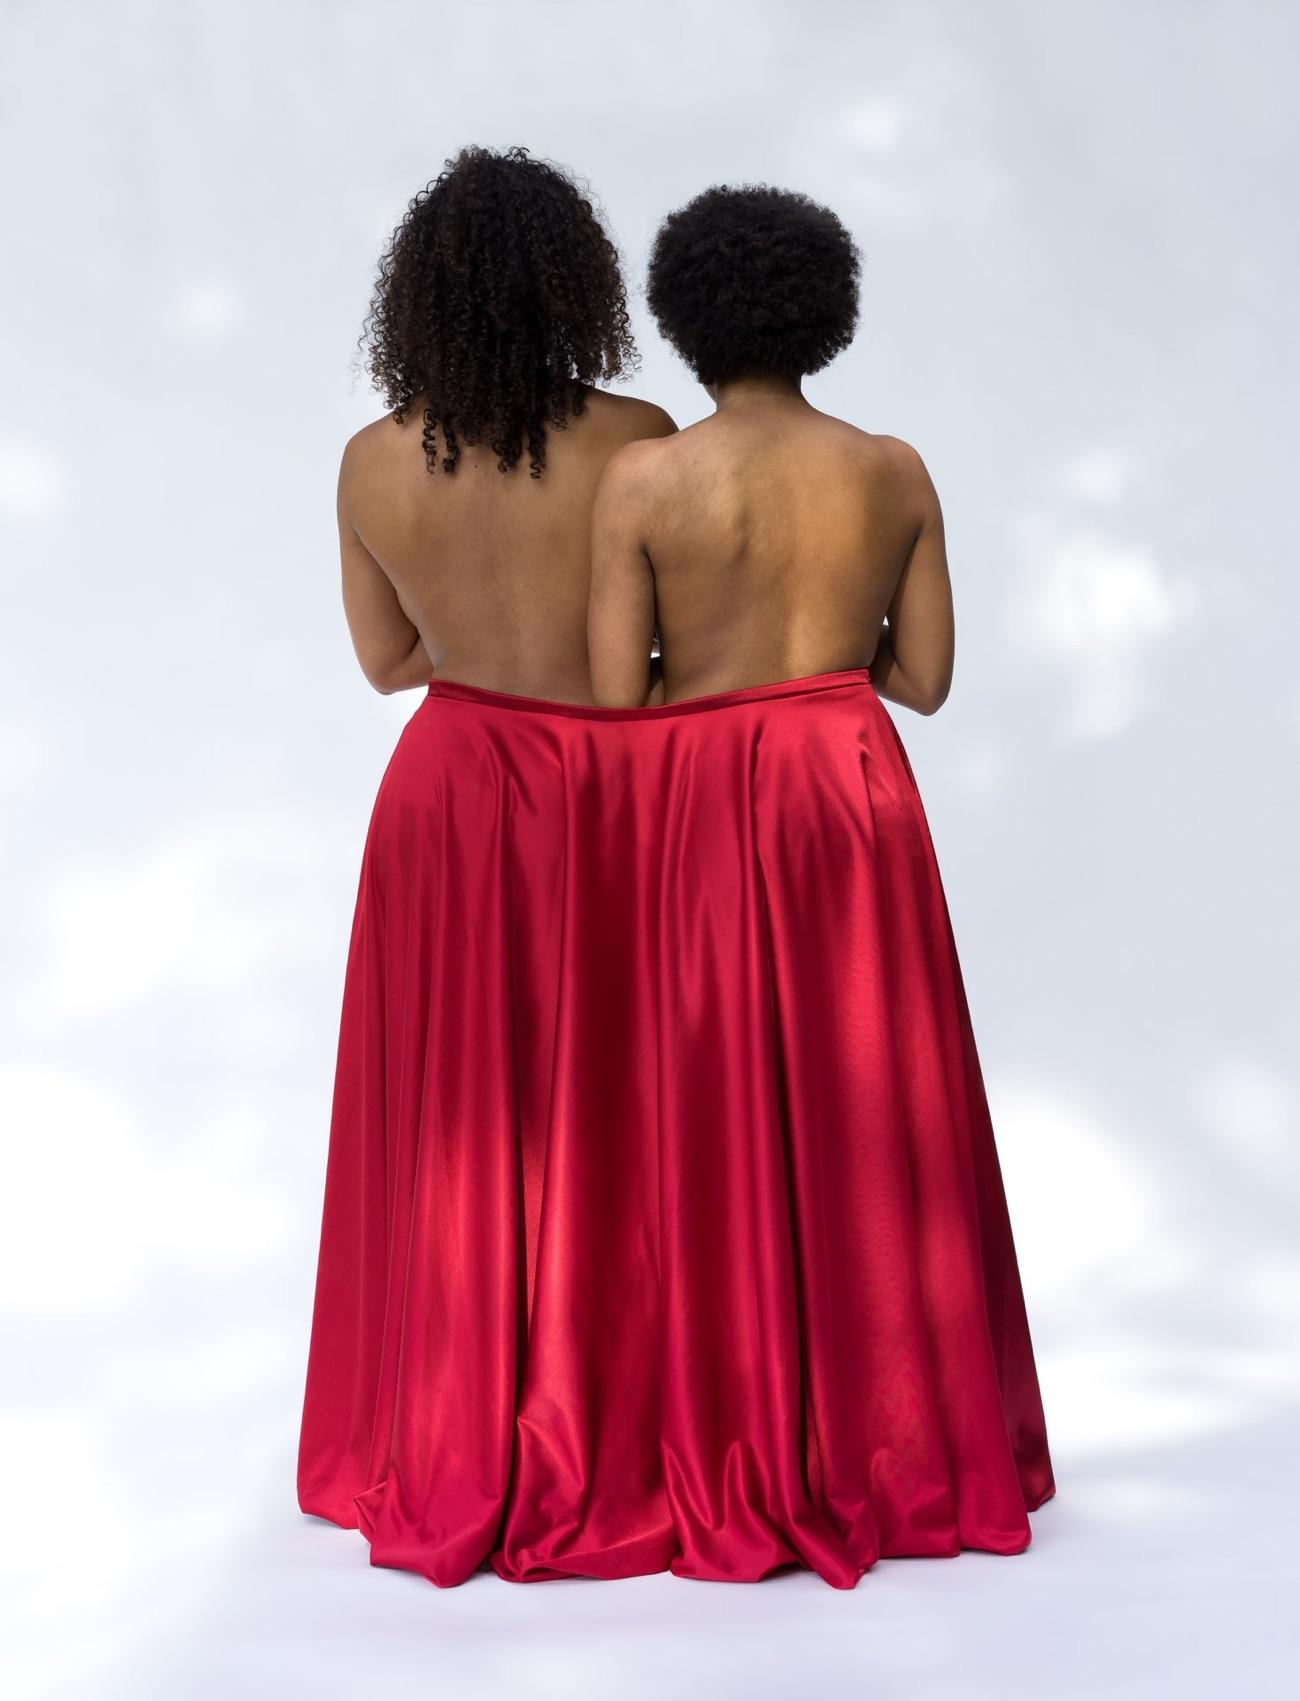 Mwangi Hutter, Twinshipping, 2016. Image courtesy of Mariane Ibrahim Gallery.